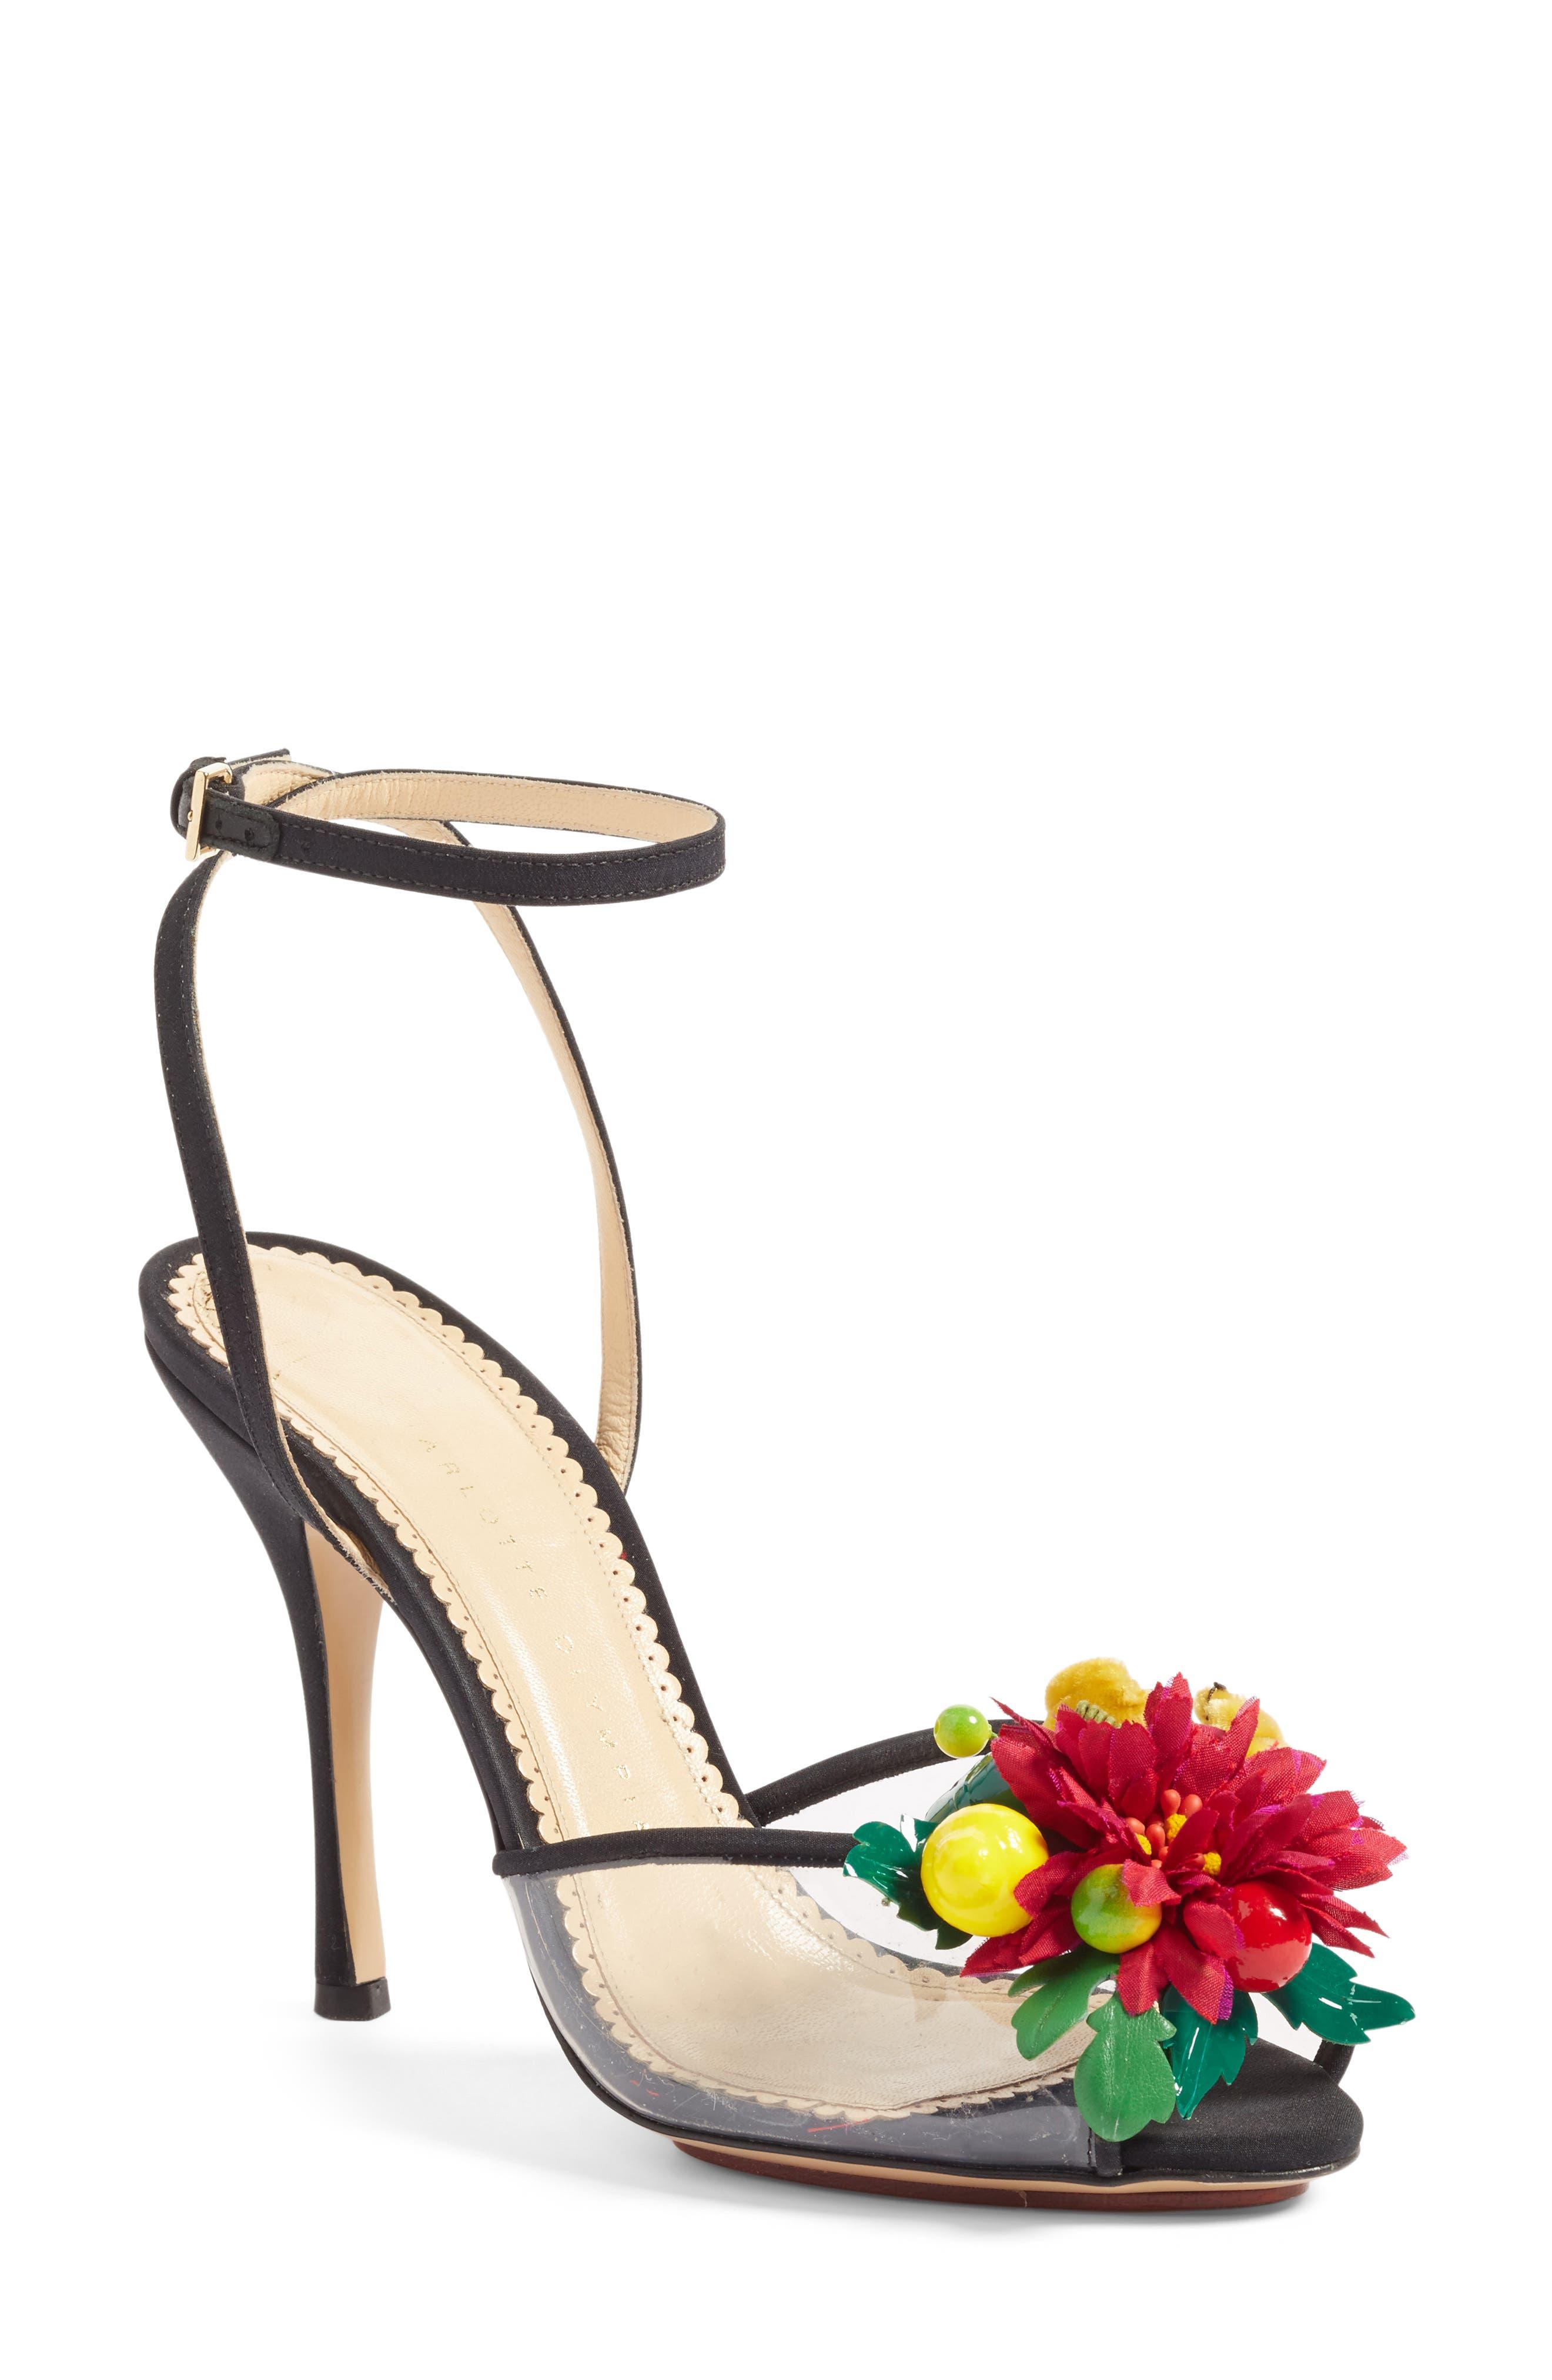 Main Image - Charlotte Olympia Tropicana Ankle Strap Sandal (Women)